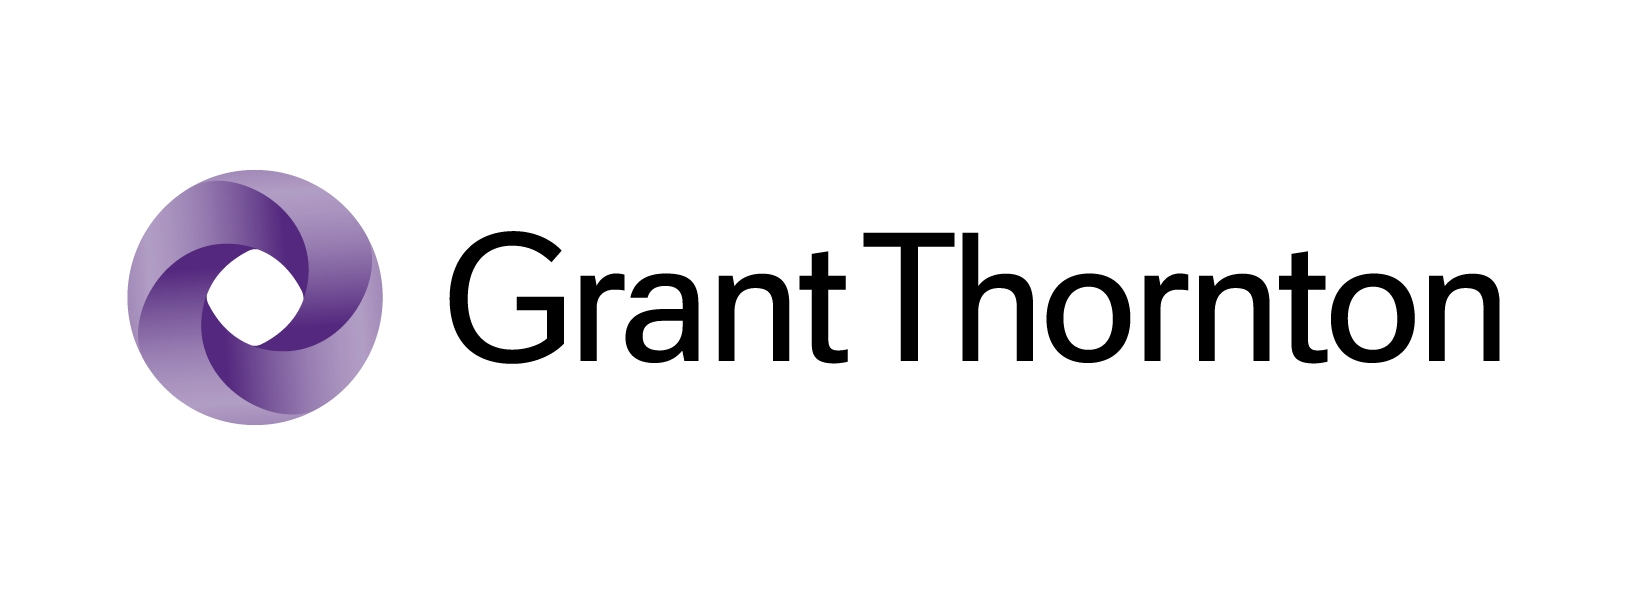 Sponsored By - Grant Thornton Chicago171 N. Clark Street, Chicago, IL 60601